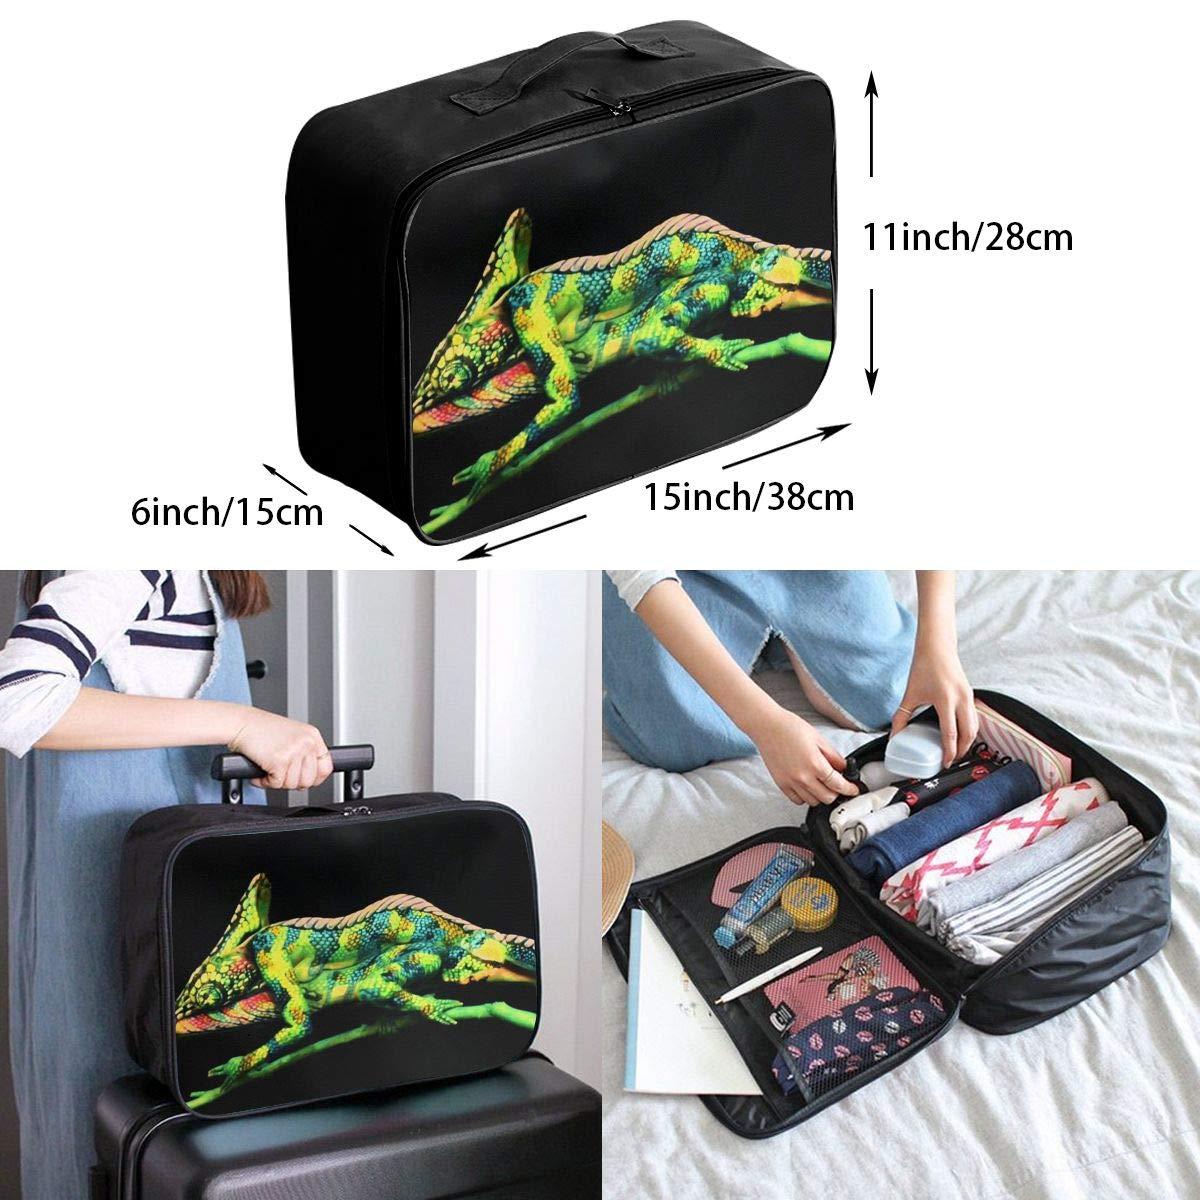 Travel Luggage Duffle Bag Lightweight Portable Handbag Green Lizard Print Large Capacity Waterproof Foldable Storage Tote